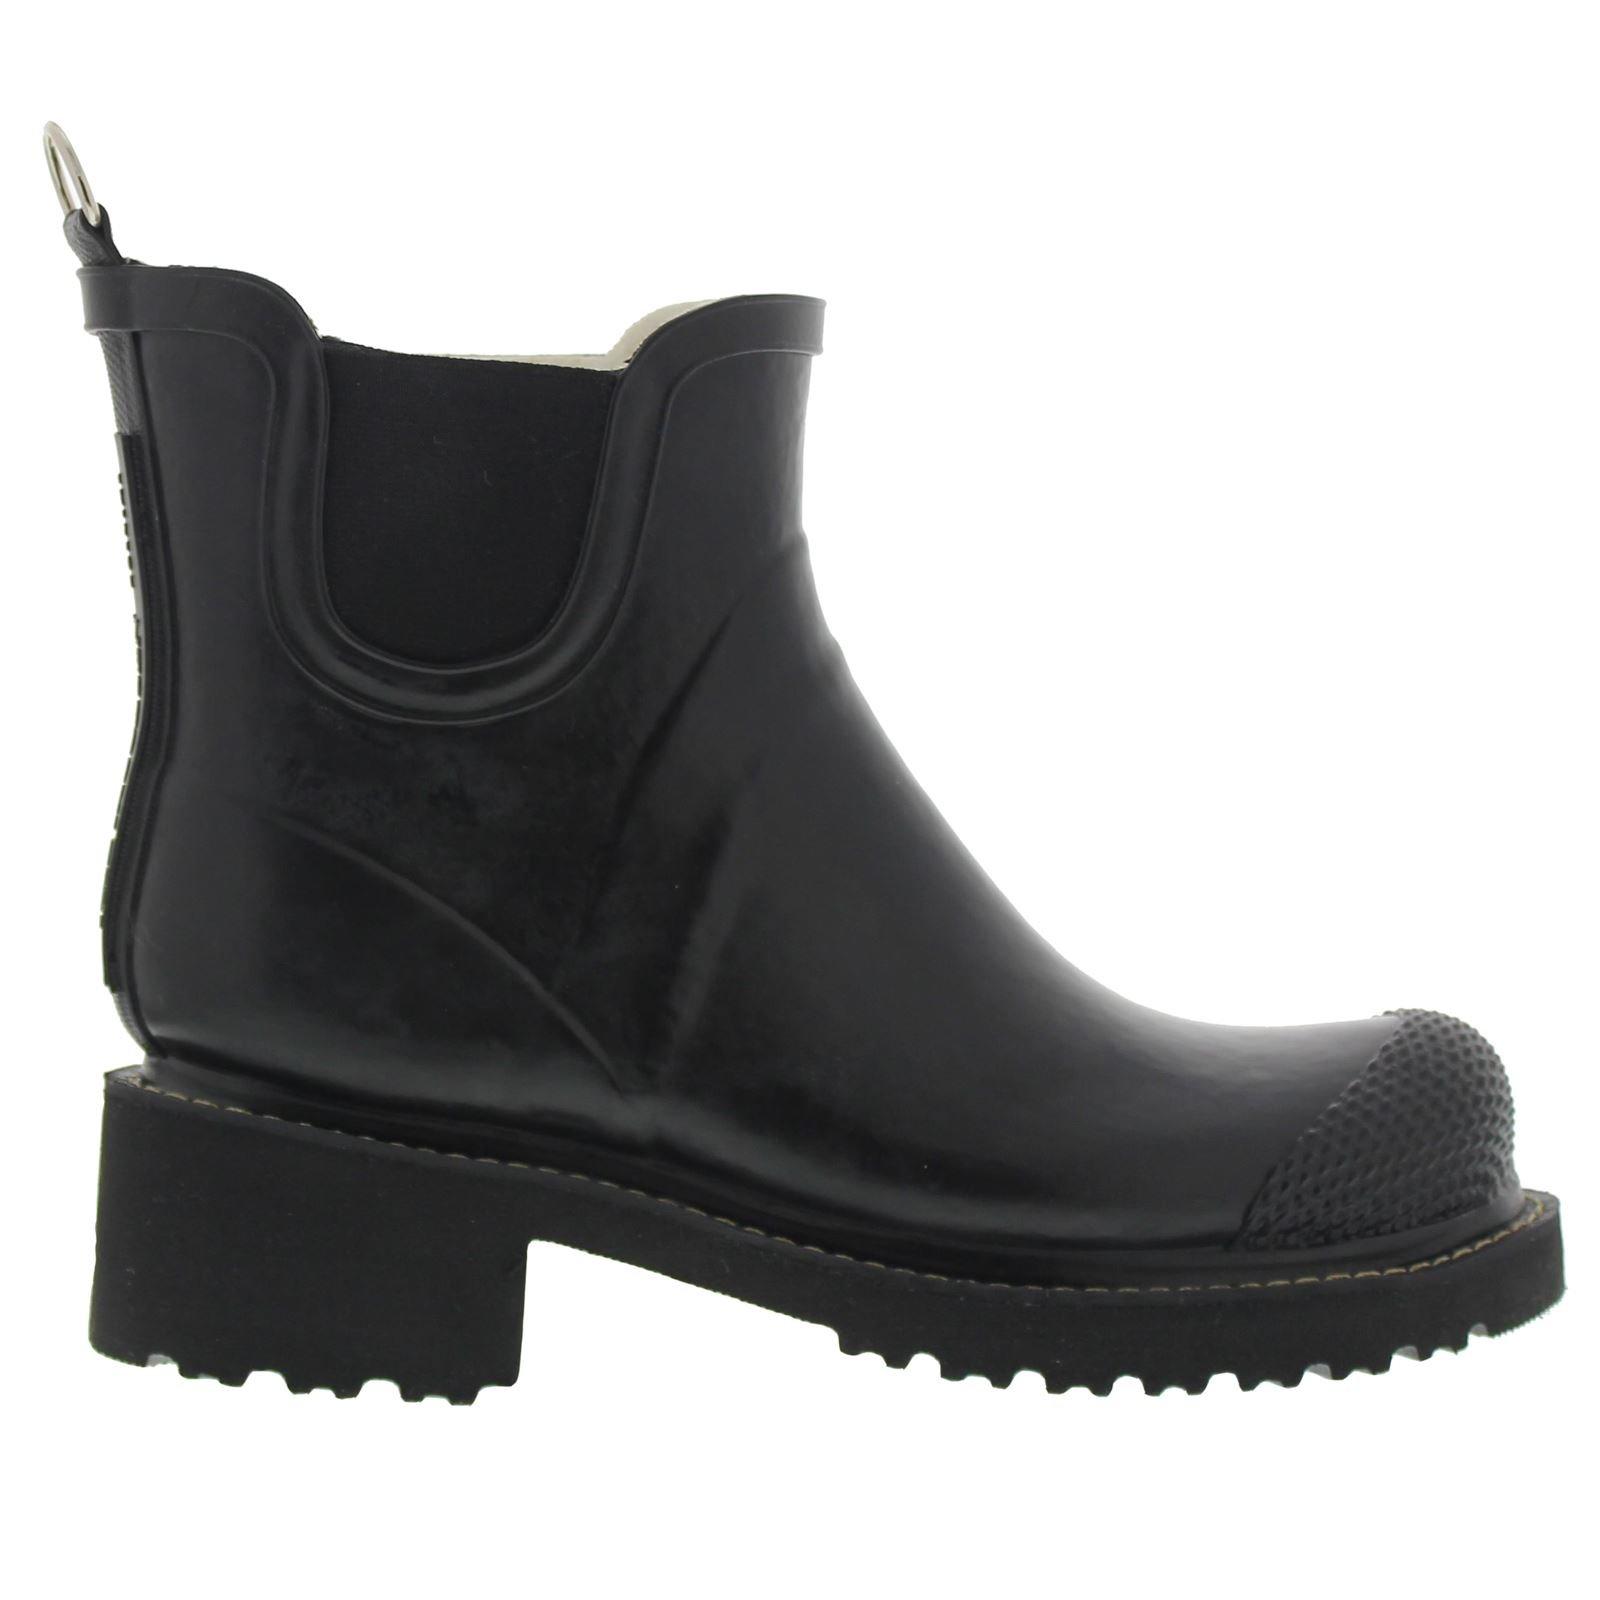 ILSE JACOBSEN Women's Rub 47 Rain Boot, Black, 40 EU/10 M US